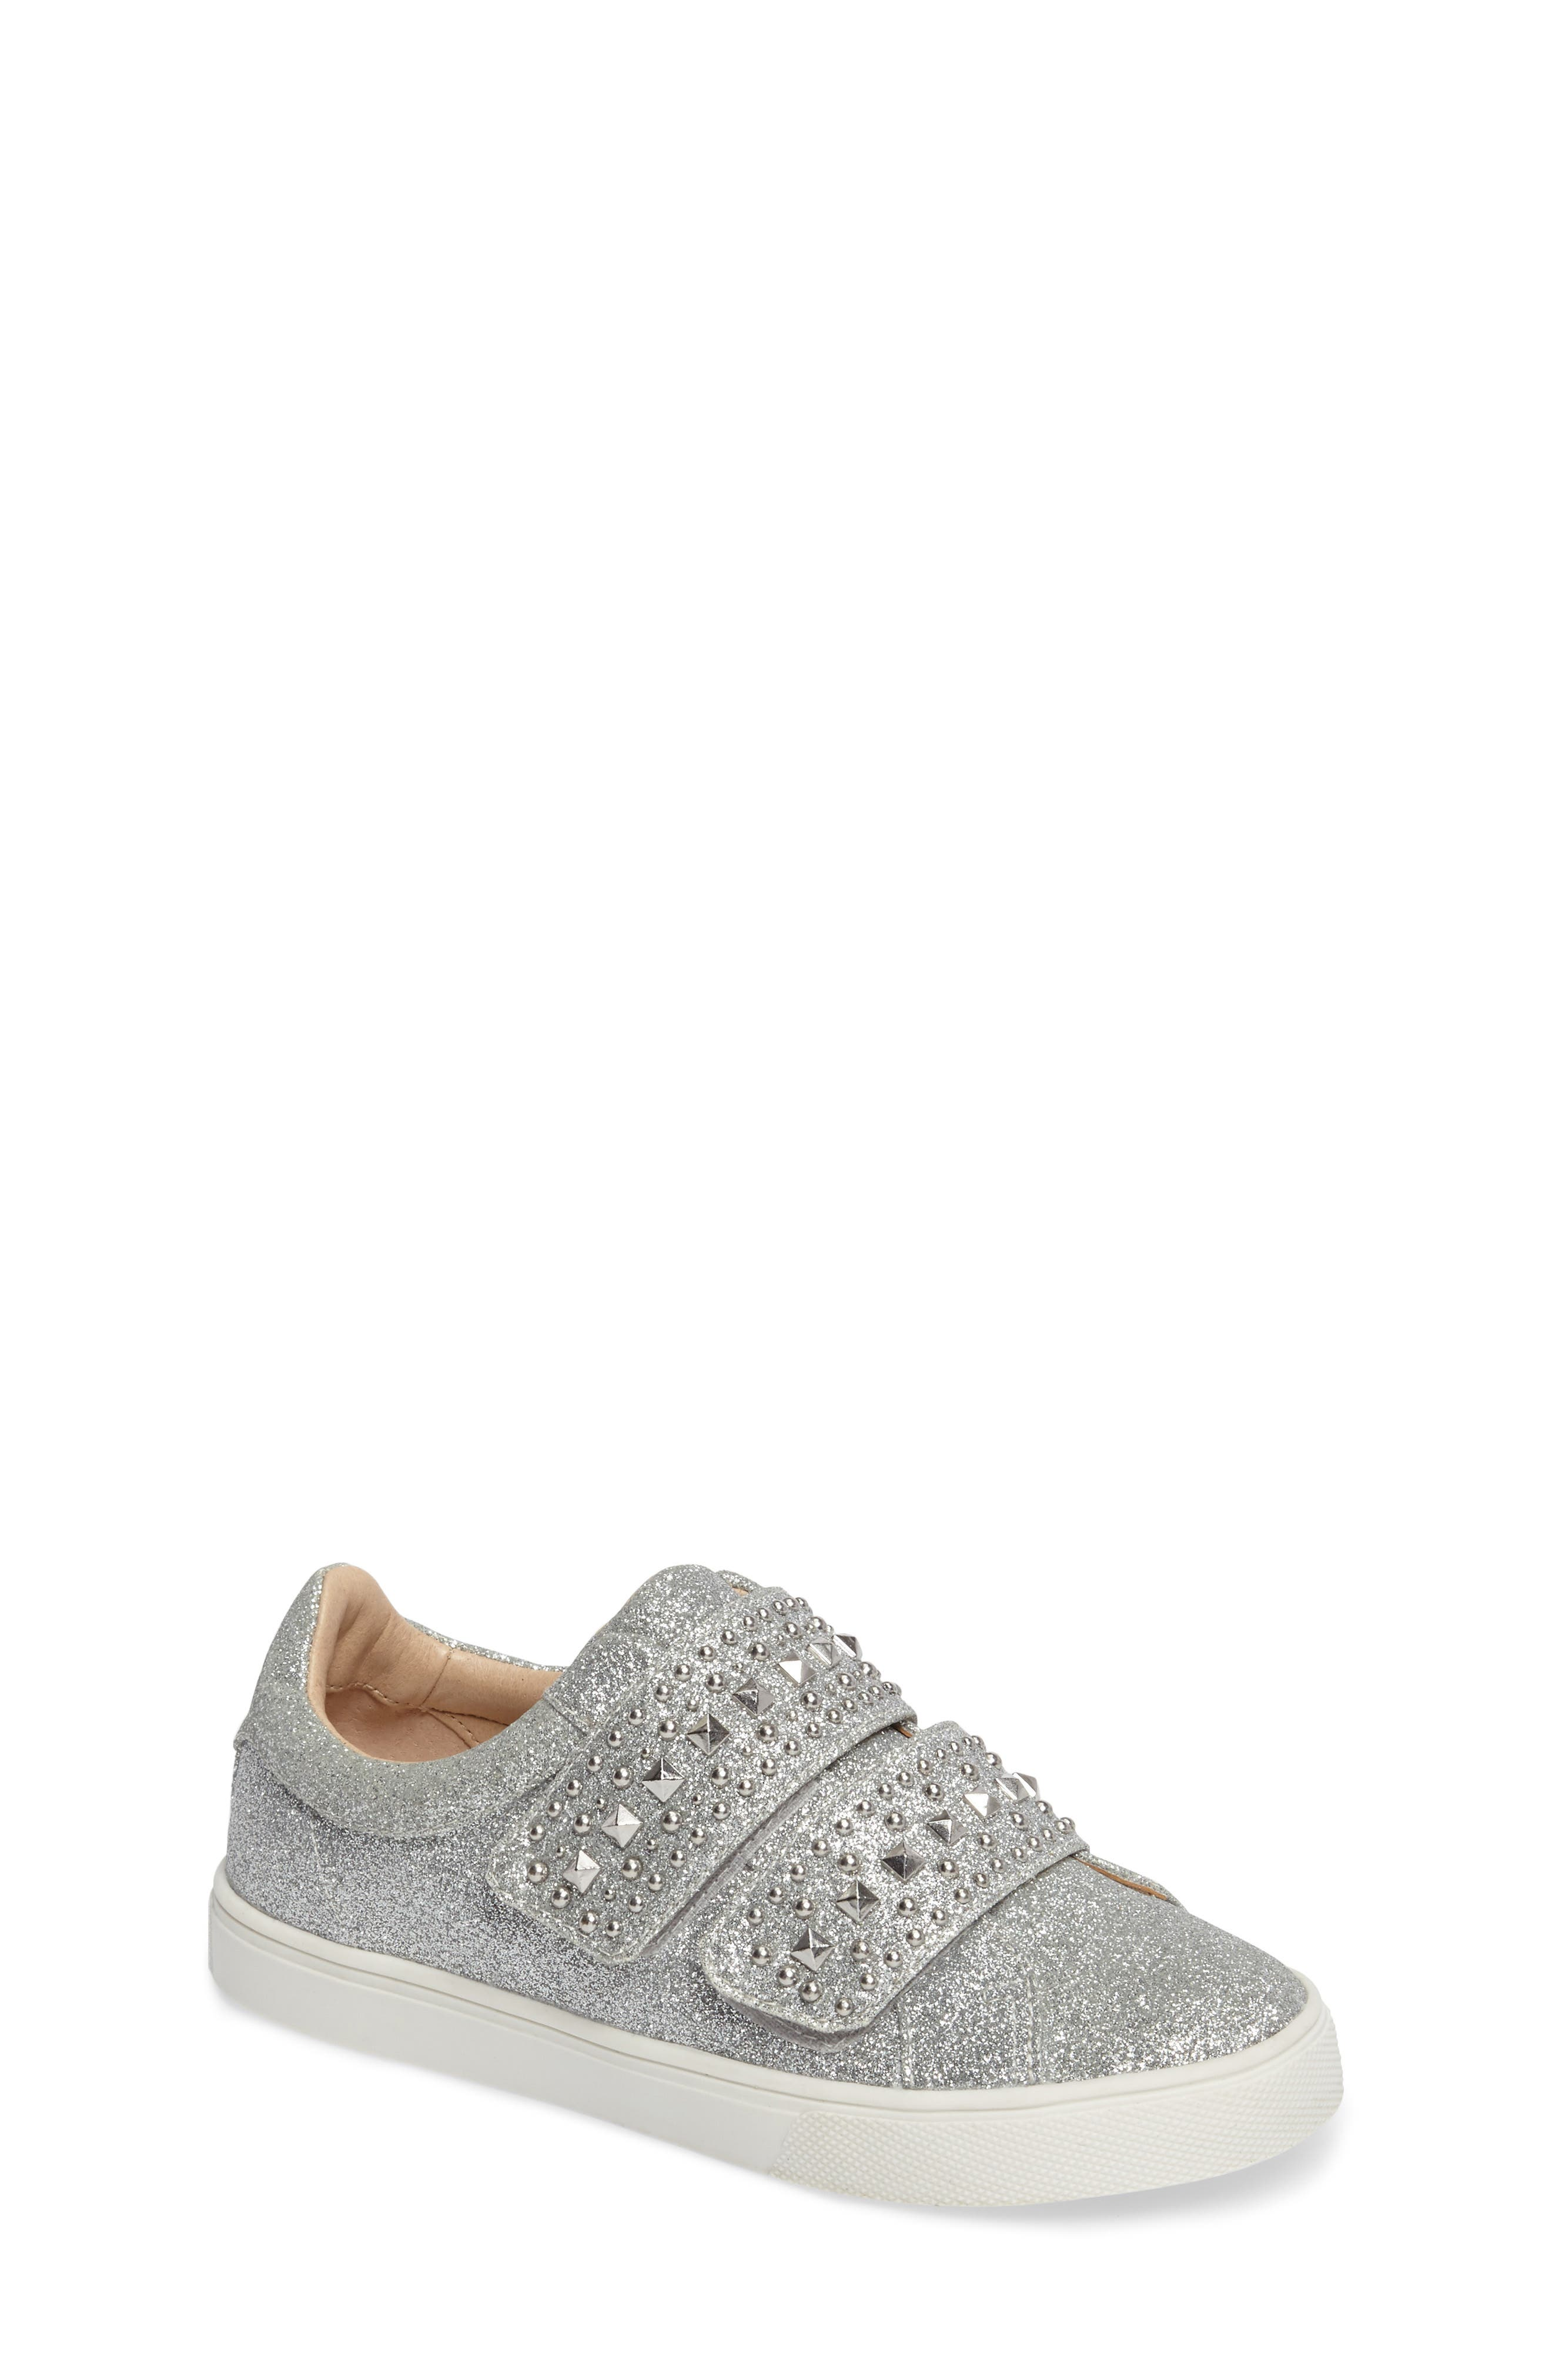 Baylen Embellished Glitter Sneaker,                             Main thumbnail 1, color,                             SILVER GLITTER